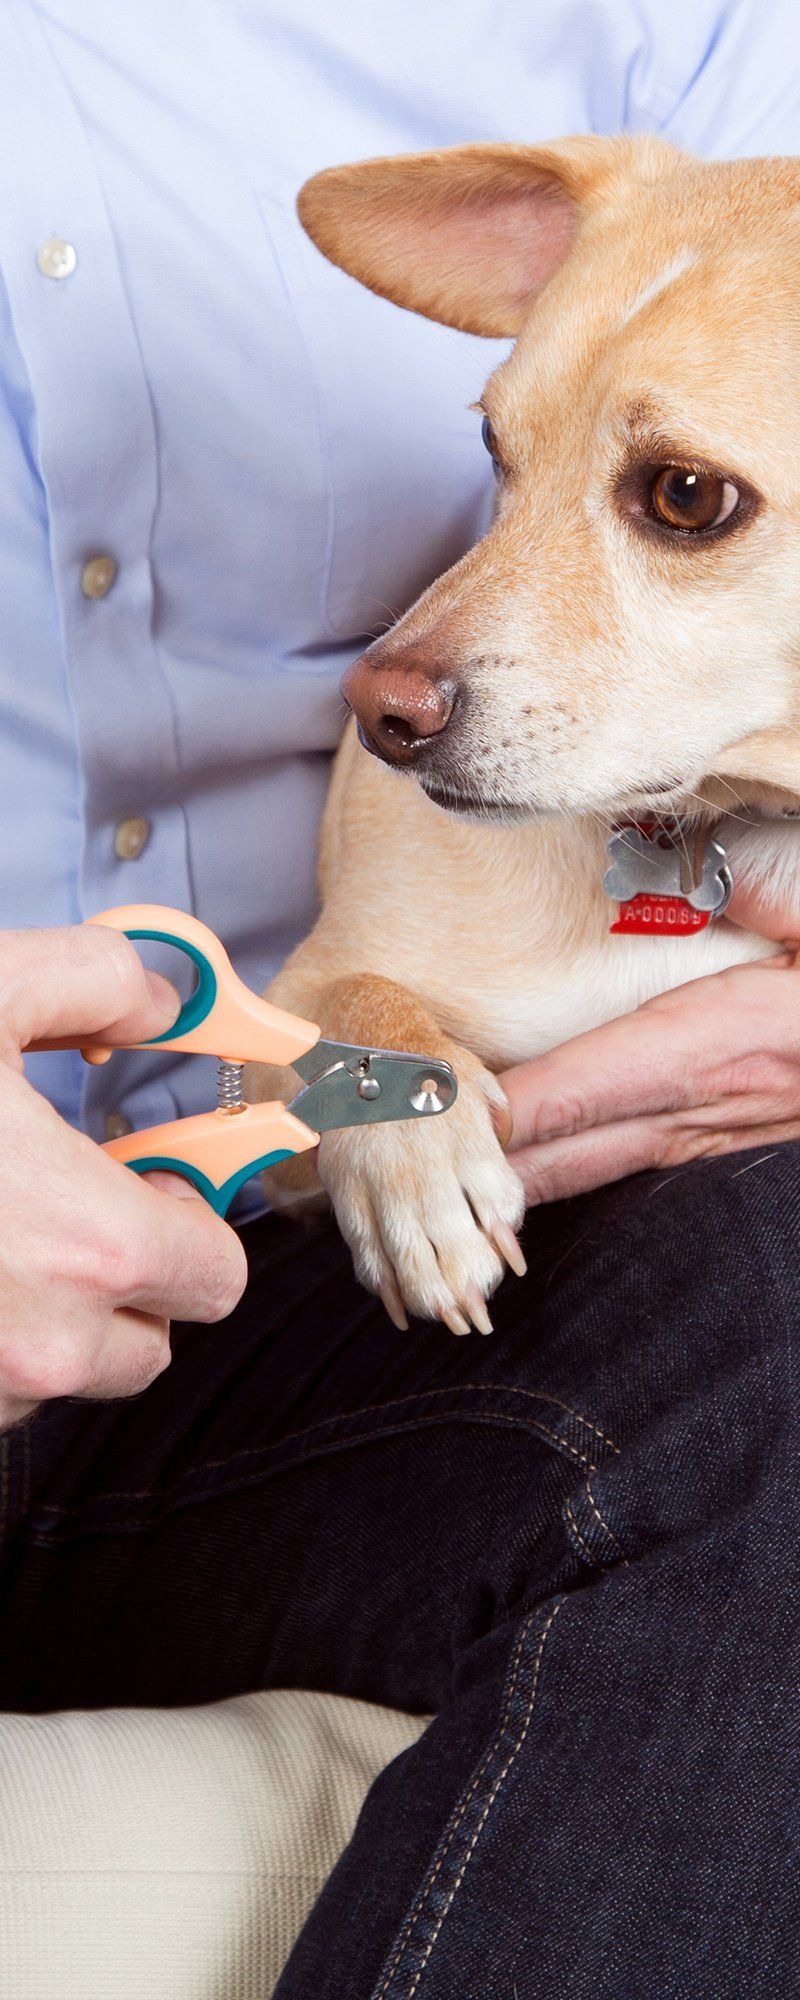 Zen Clipper Safety Pet Nail Clipper Pets, Happy animals